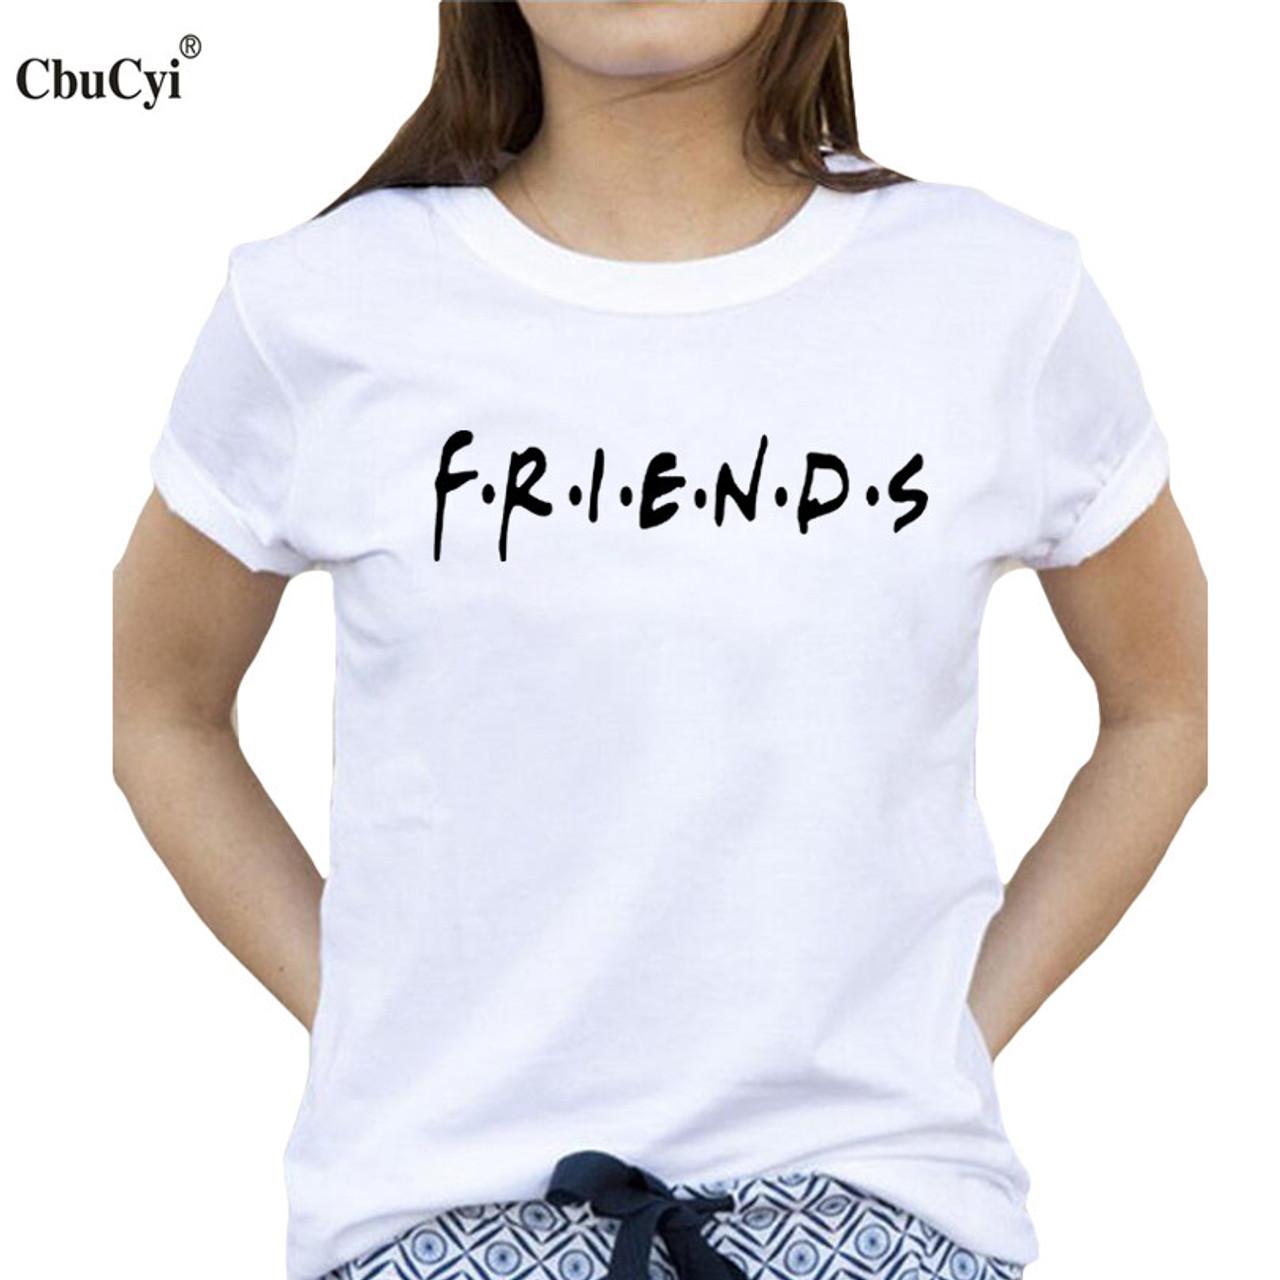 47cc75d5f8c Best Friends T-shirt Women's Summer Fashion Bff Tshirt Black White Cotton  Tops Tee 2017 ...